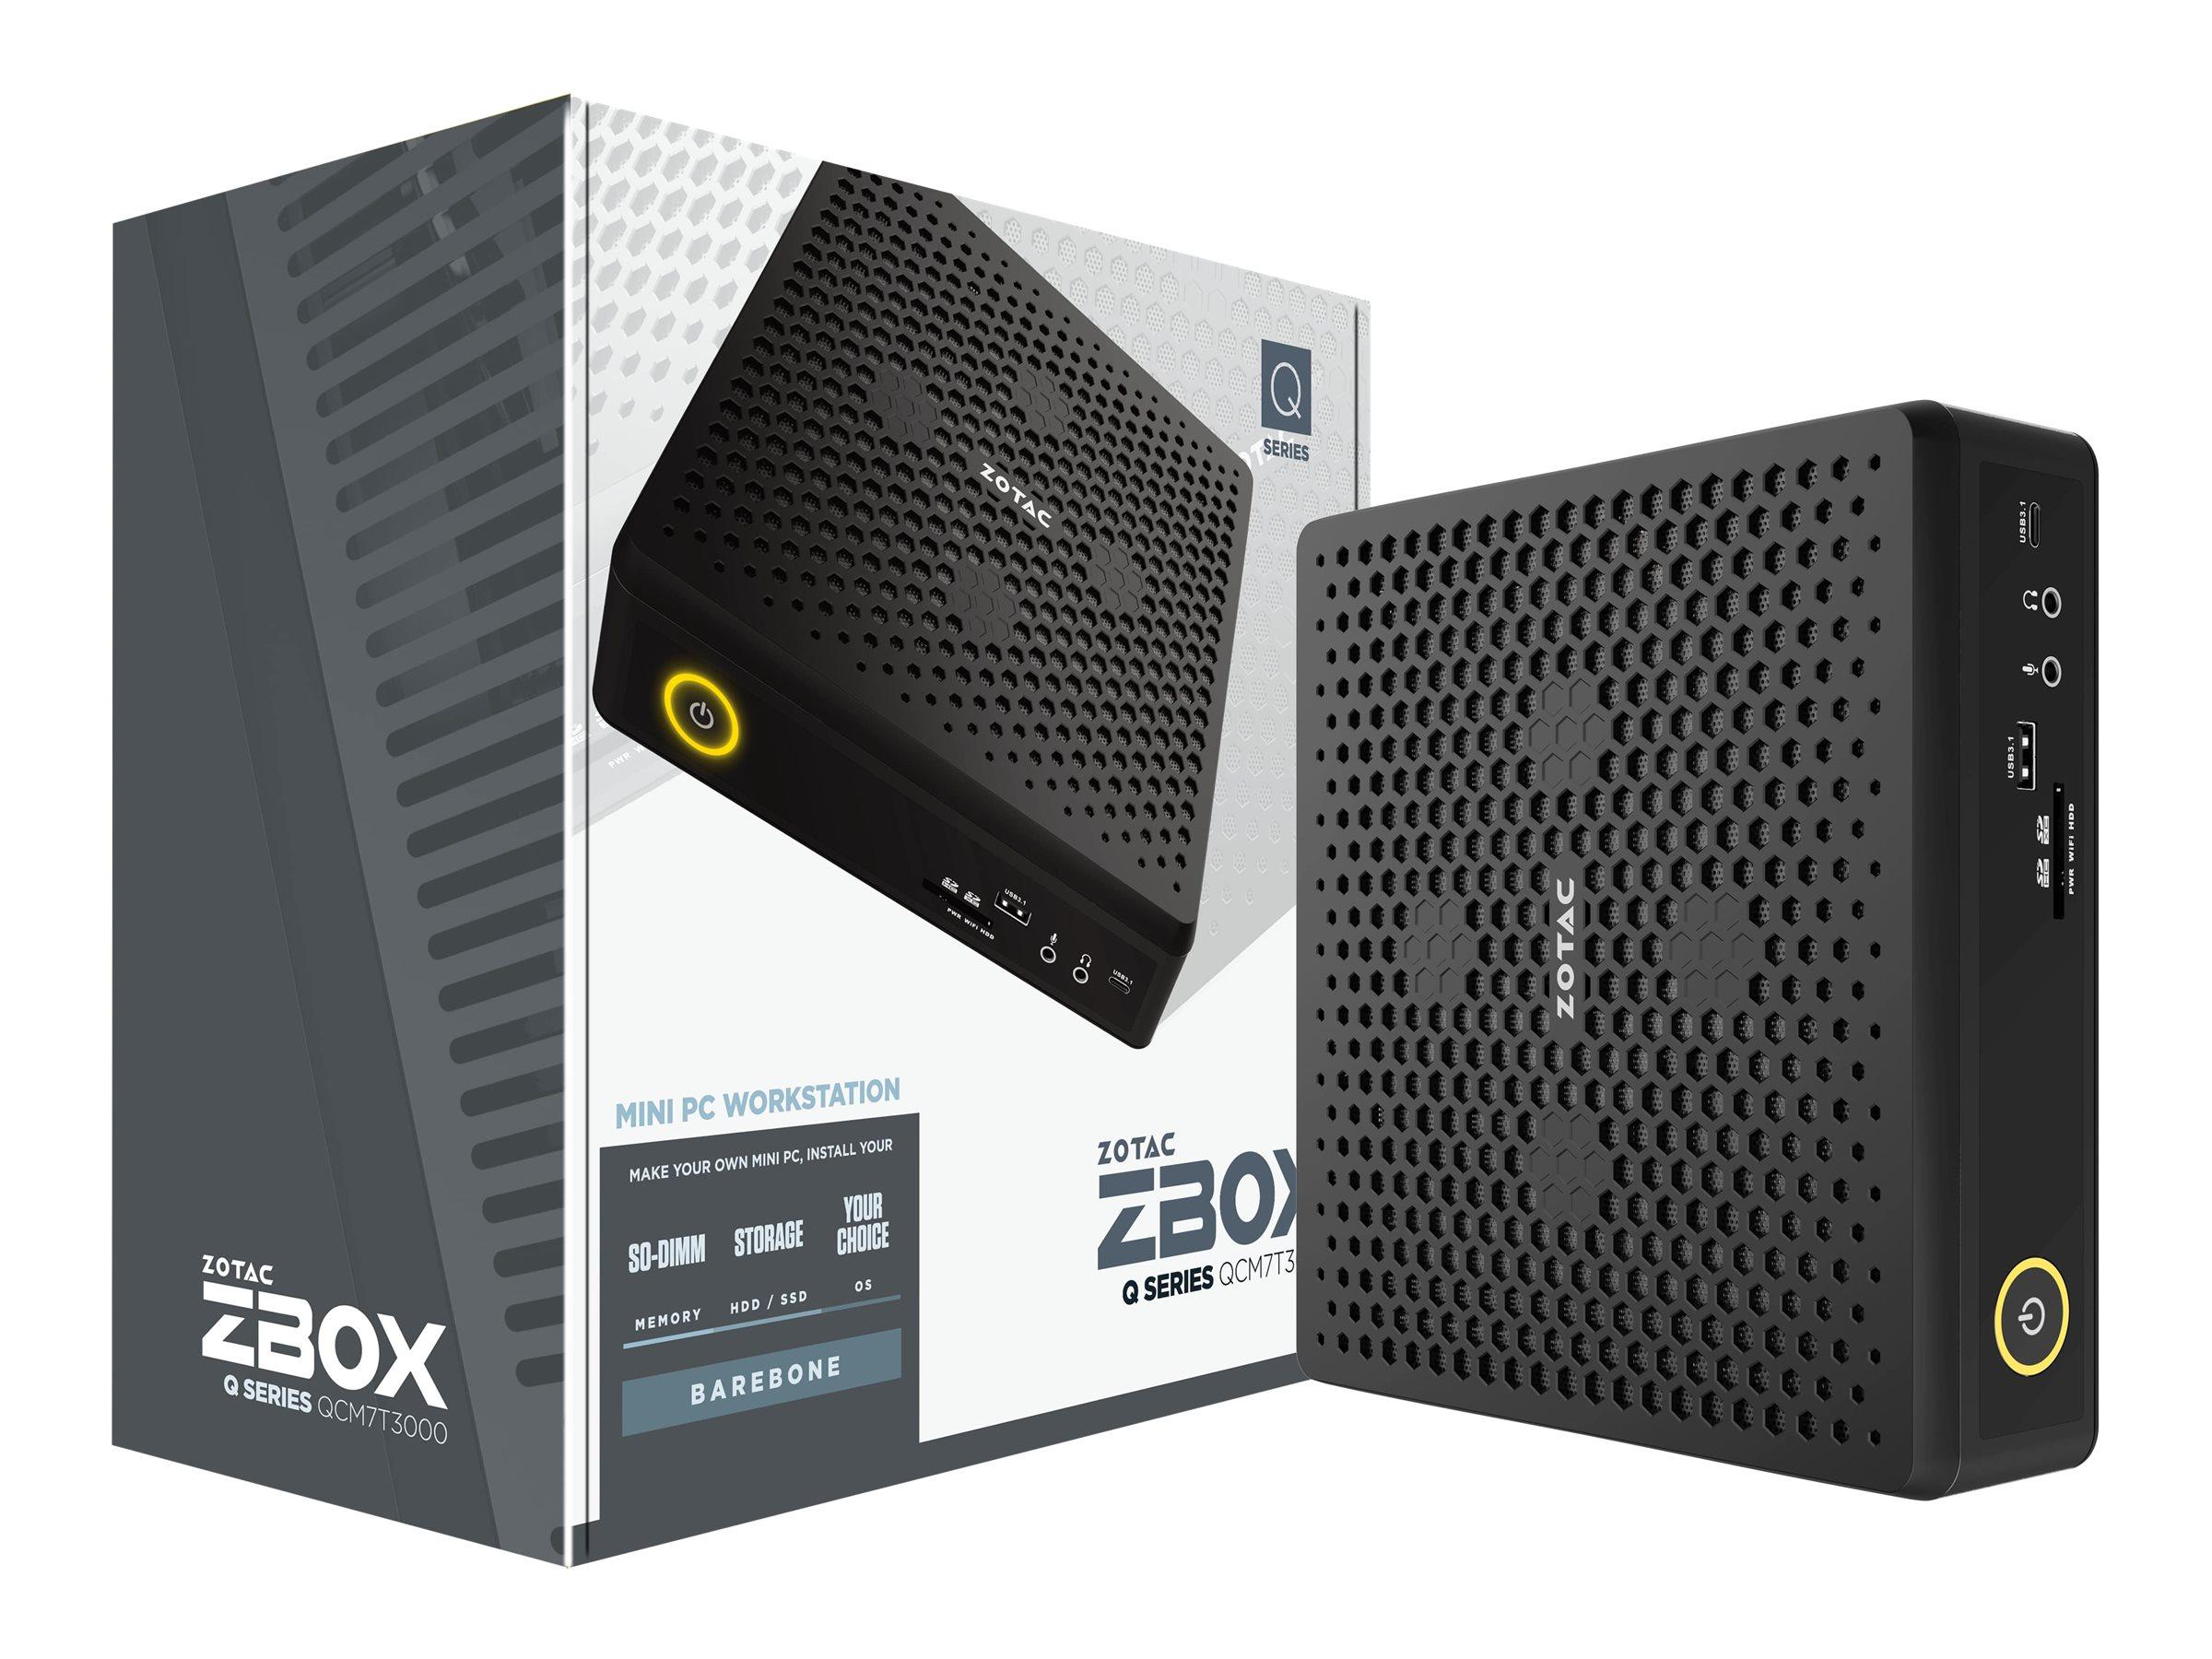 ZOTAC ZBOX Q Series QCM7T3000 - Barebone - Mini-PC - 1 x Core i7 10750H / 2.6 GHz - RAM 0 GB - Quadro RTX 3000